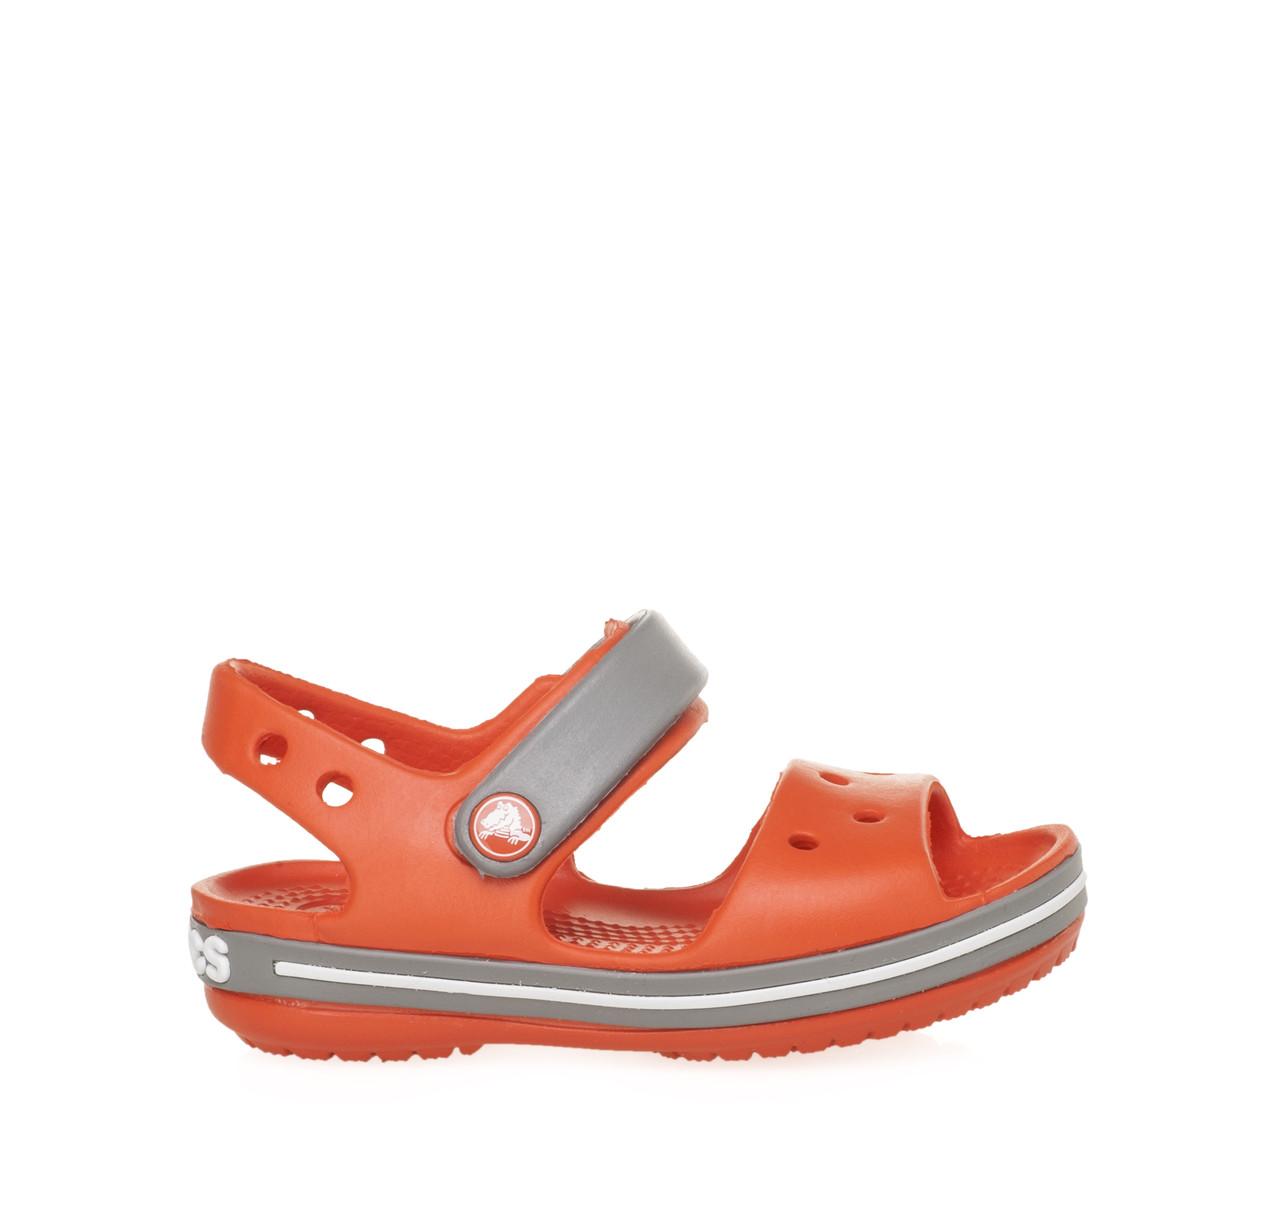 449c50eb808 Αθλητισμός > Παιδικά > Παπούτσια / adidas Originals ZX FLUX EL I ...